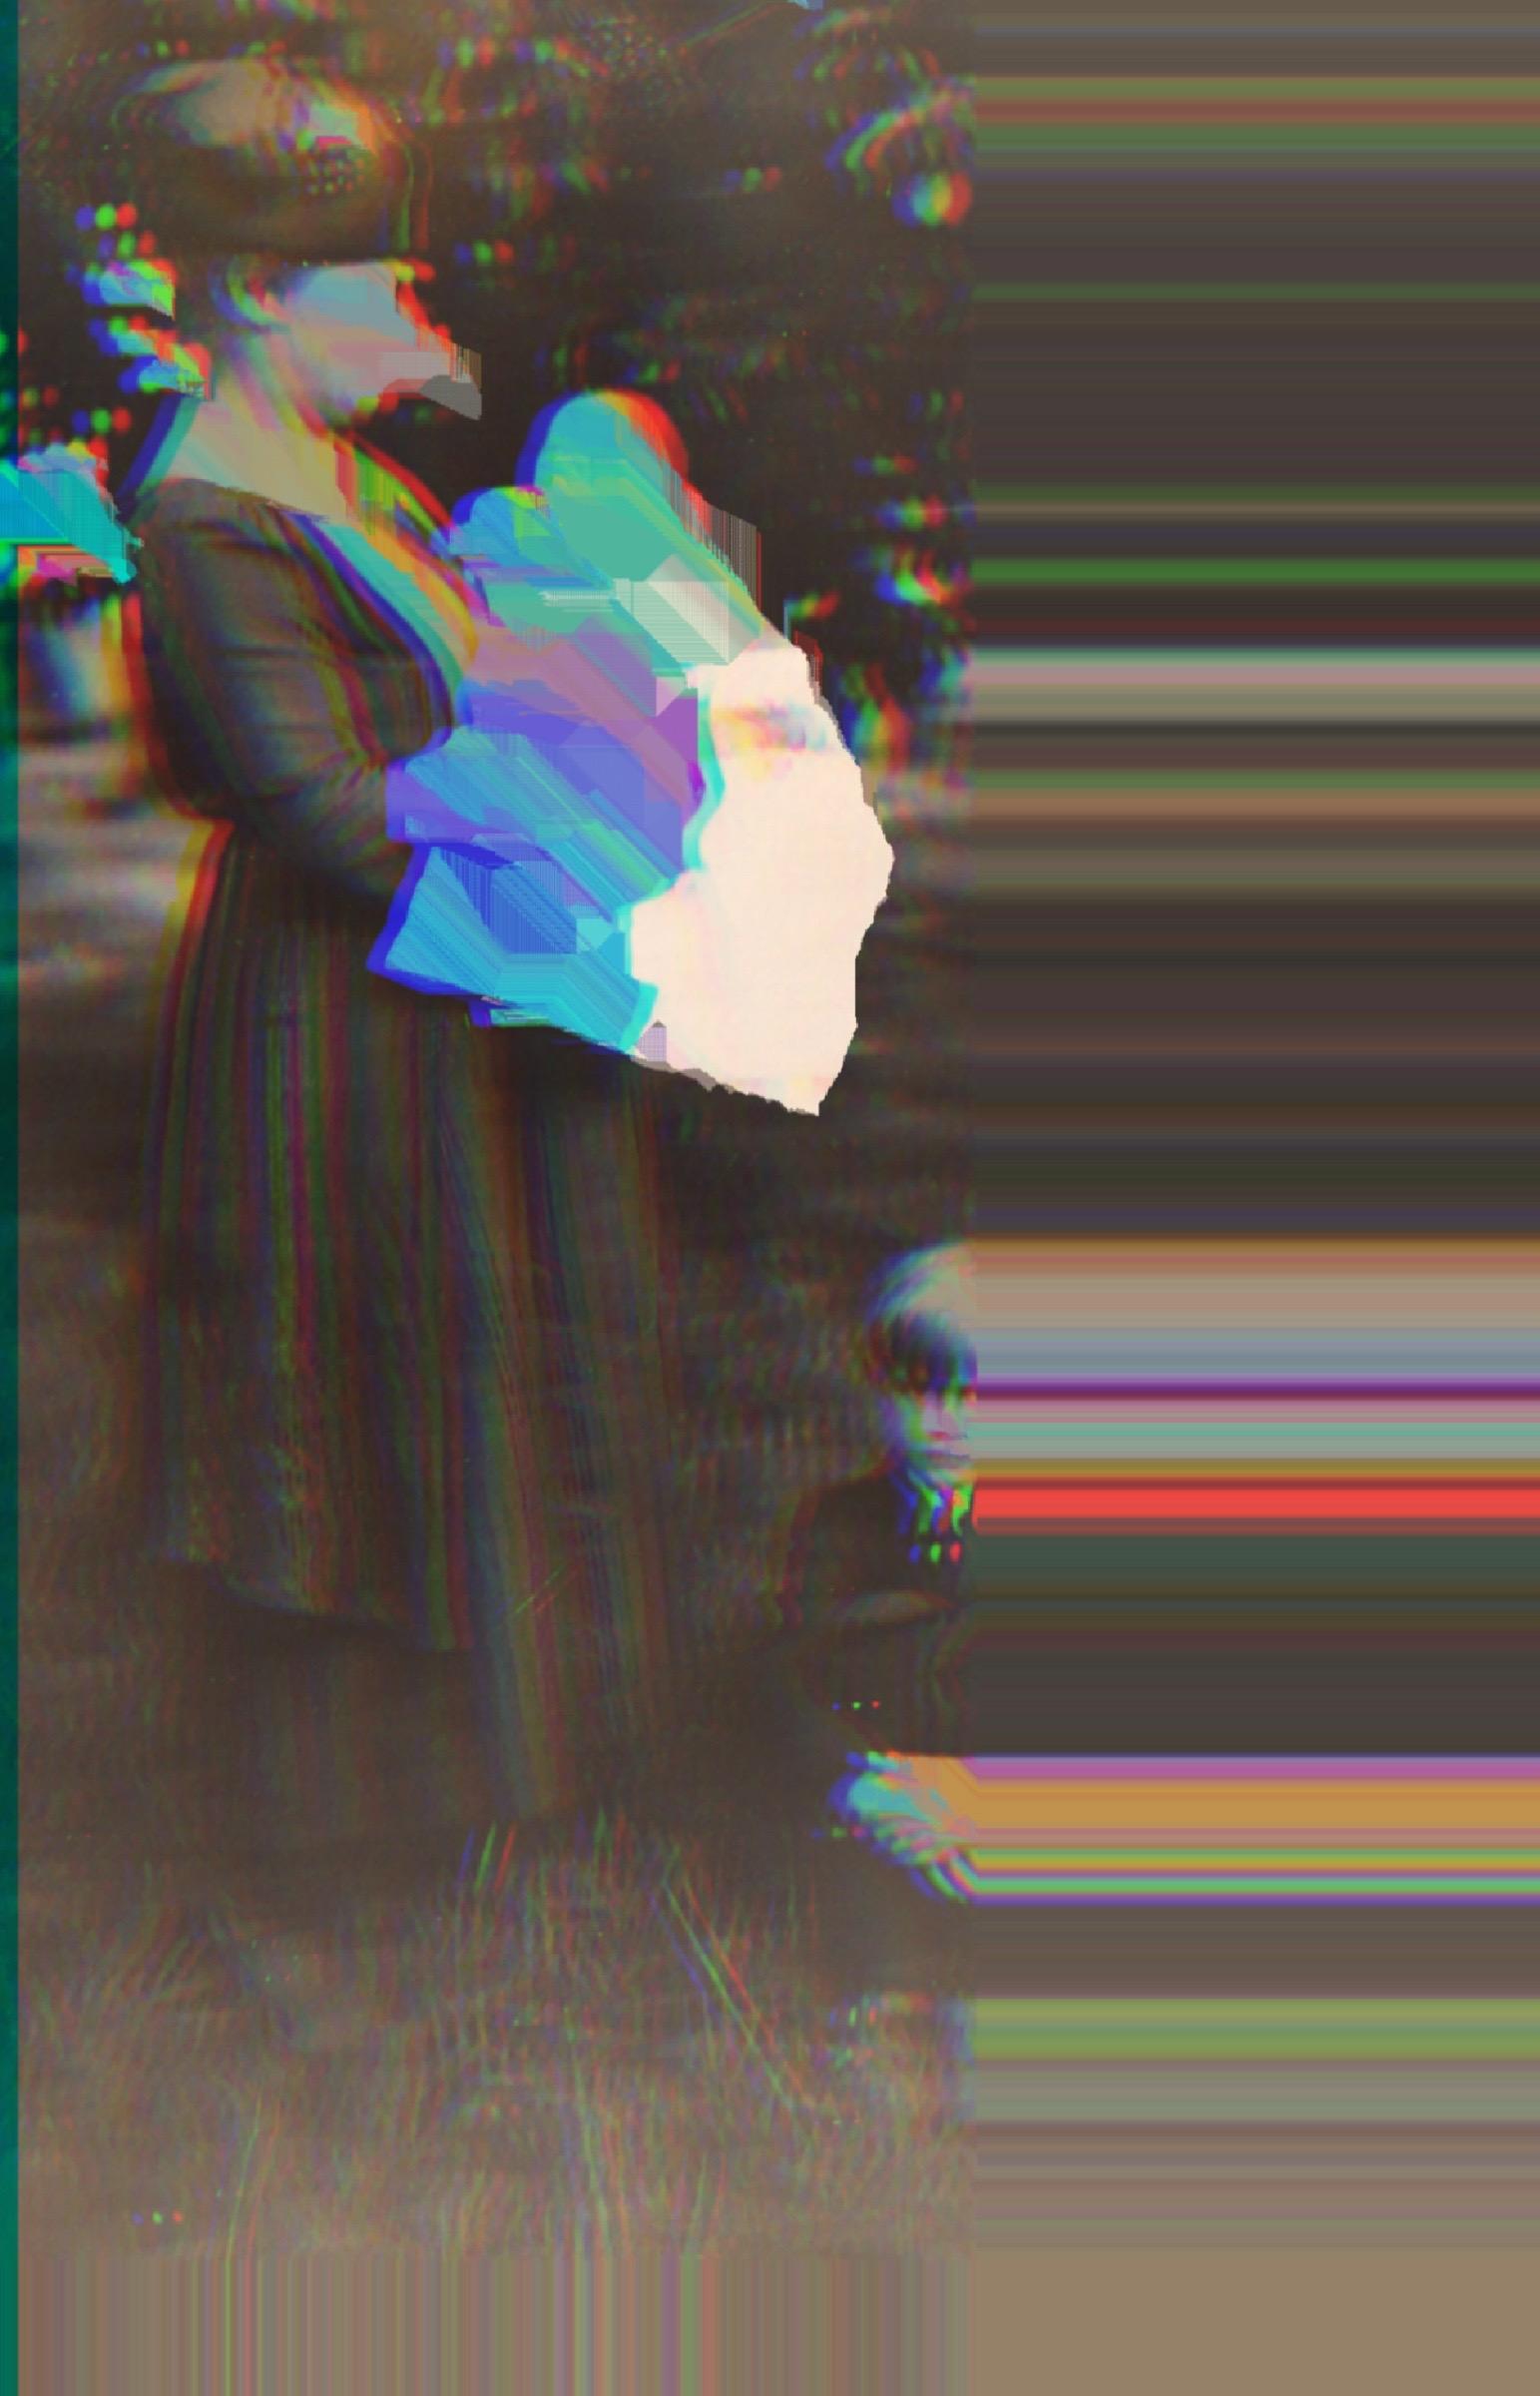 Digital Detritus No. 1    Digitally manipulated image  dimensions variable  2016